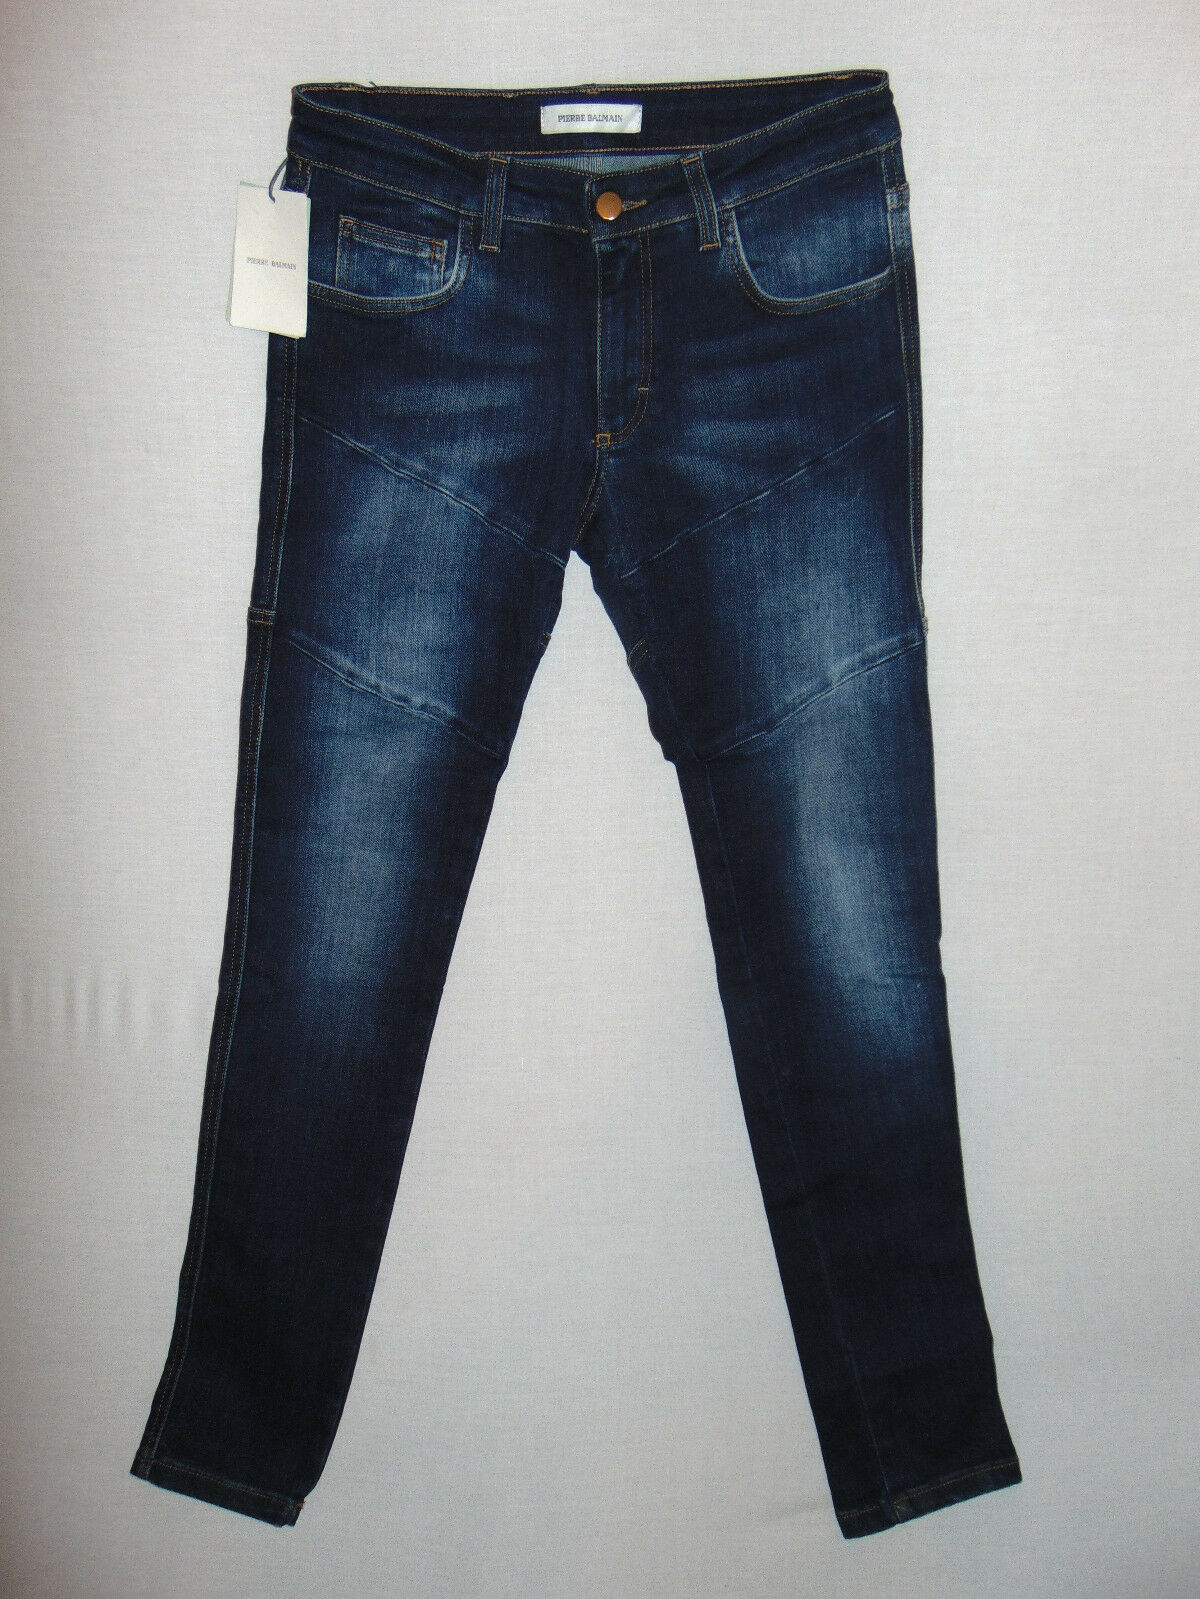 Pierre Balmain Slim W30 L32 - Ladies Blau Stretch Denim Jeans - Made in